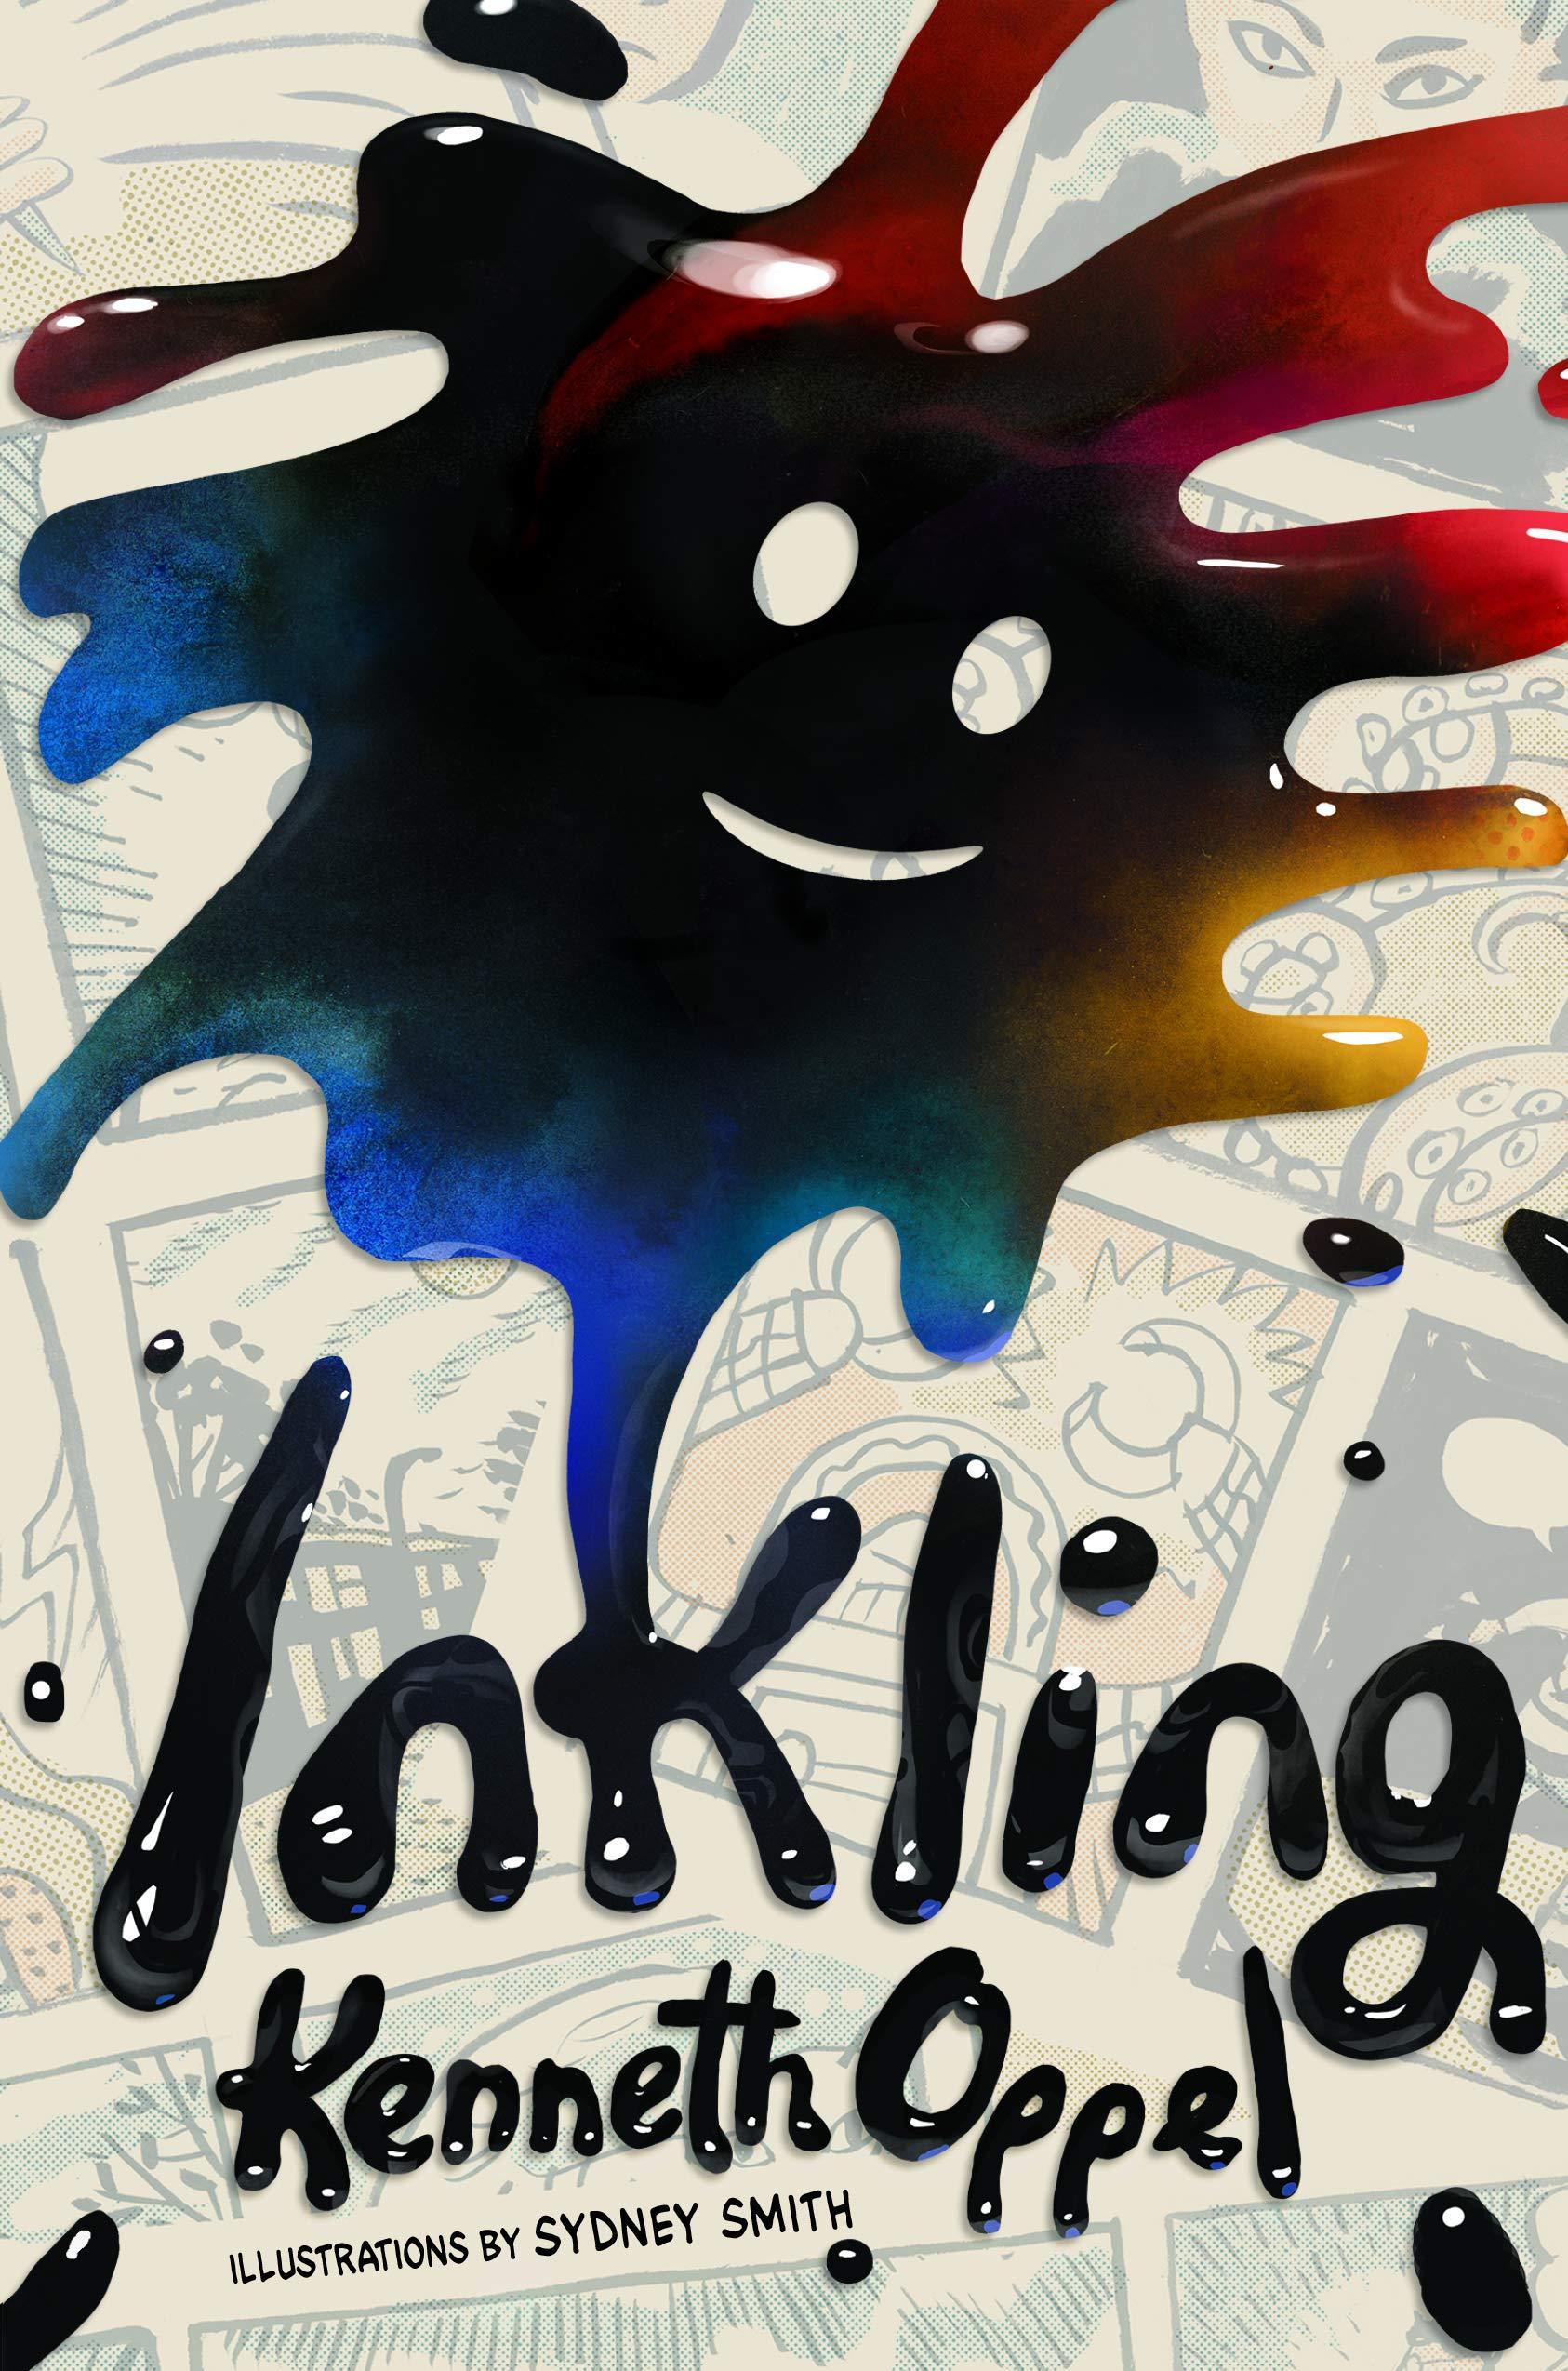 Inkling: Kenneth Oppel, Sydney Smith: 9781443450287: Books